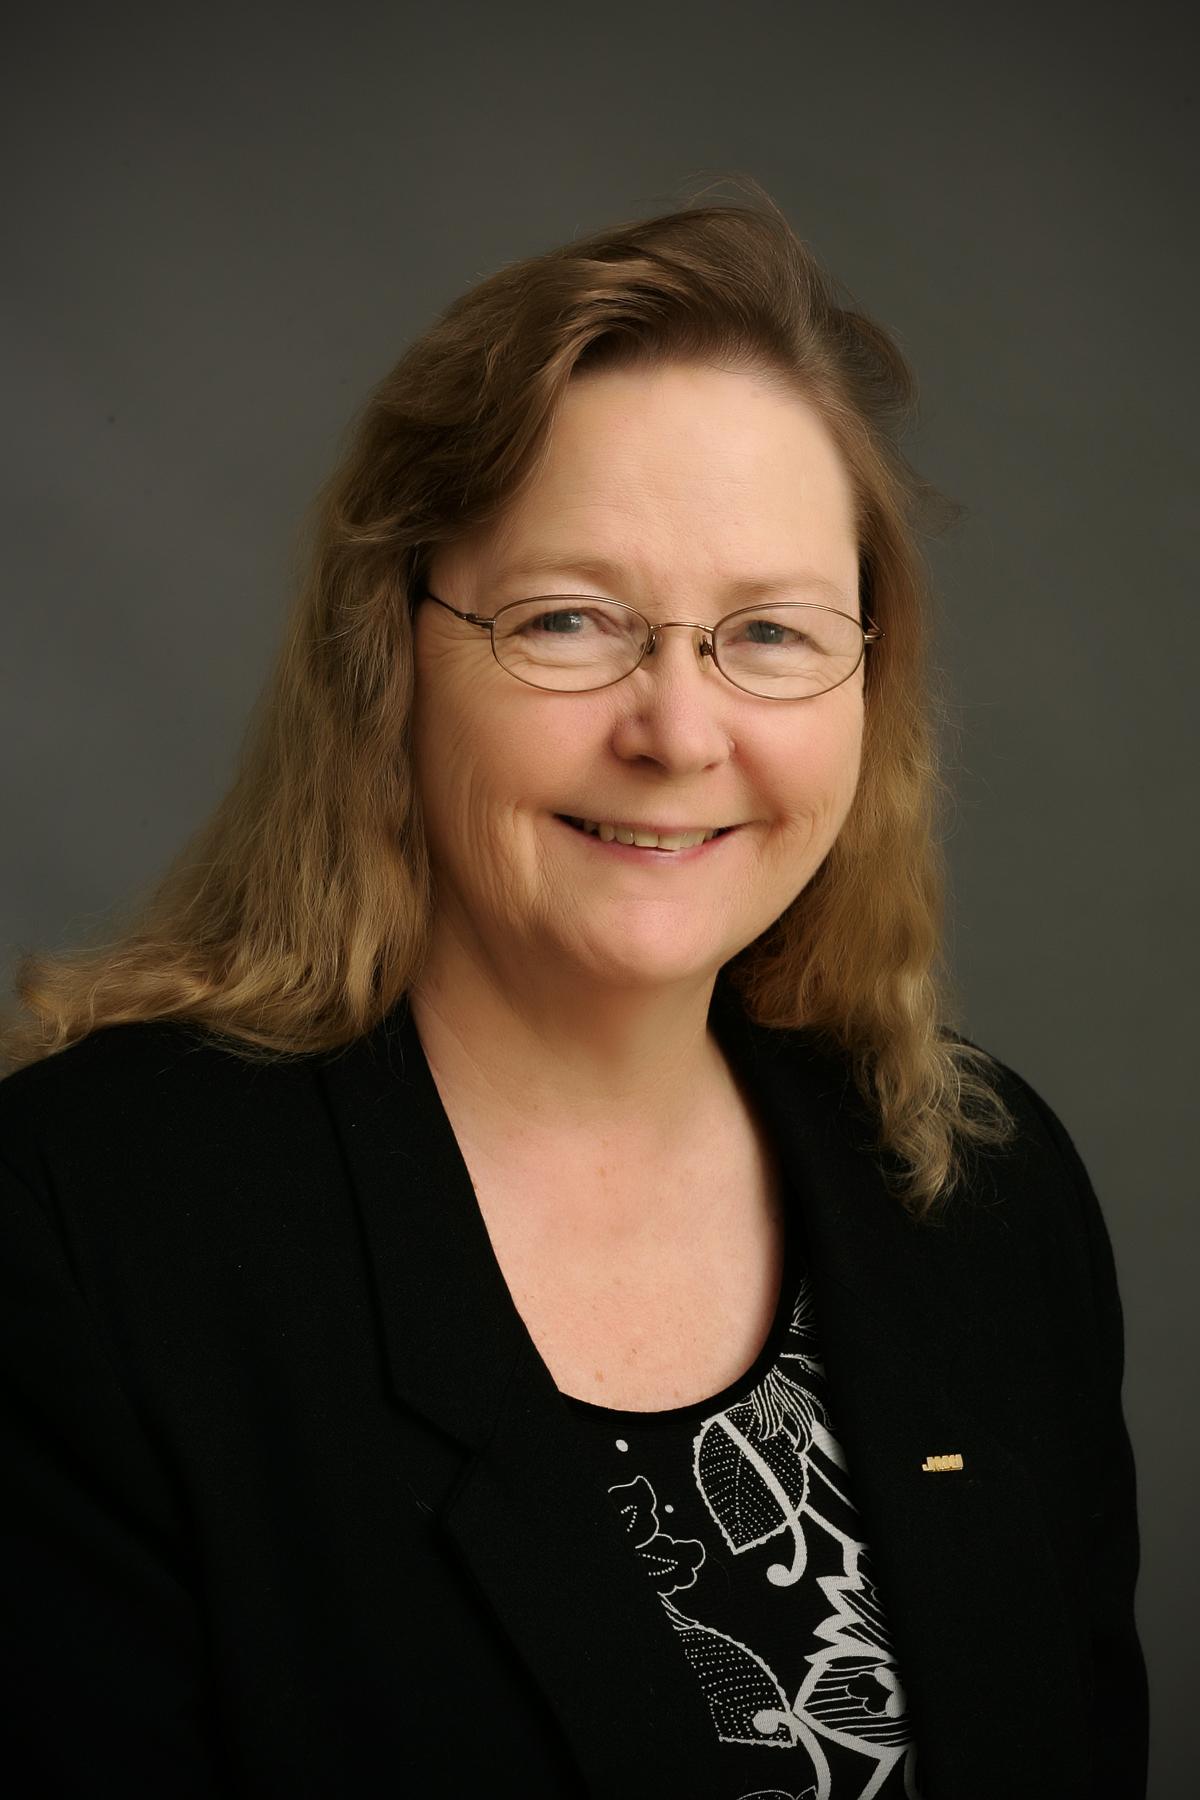 Darlene Quackenbush